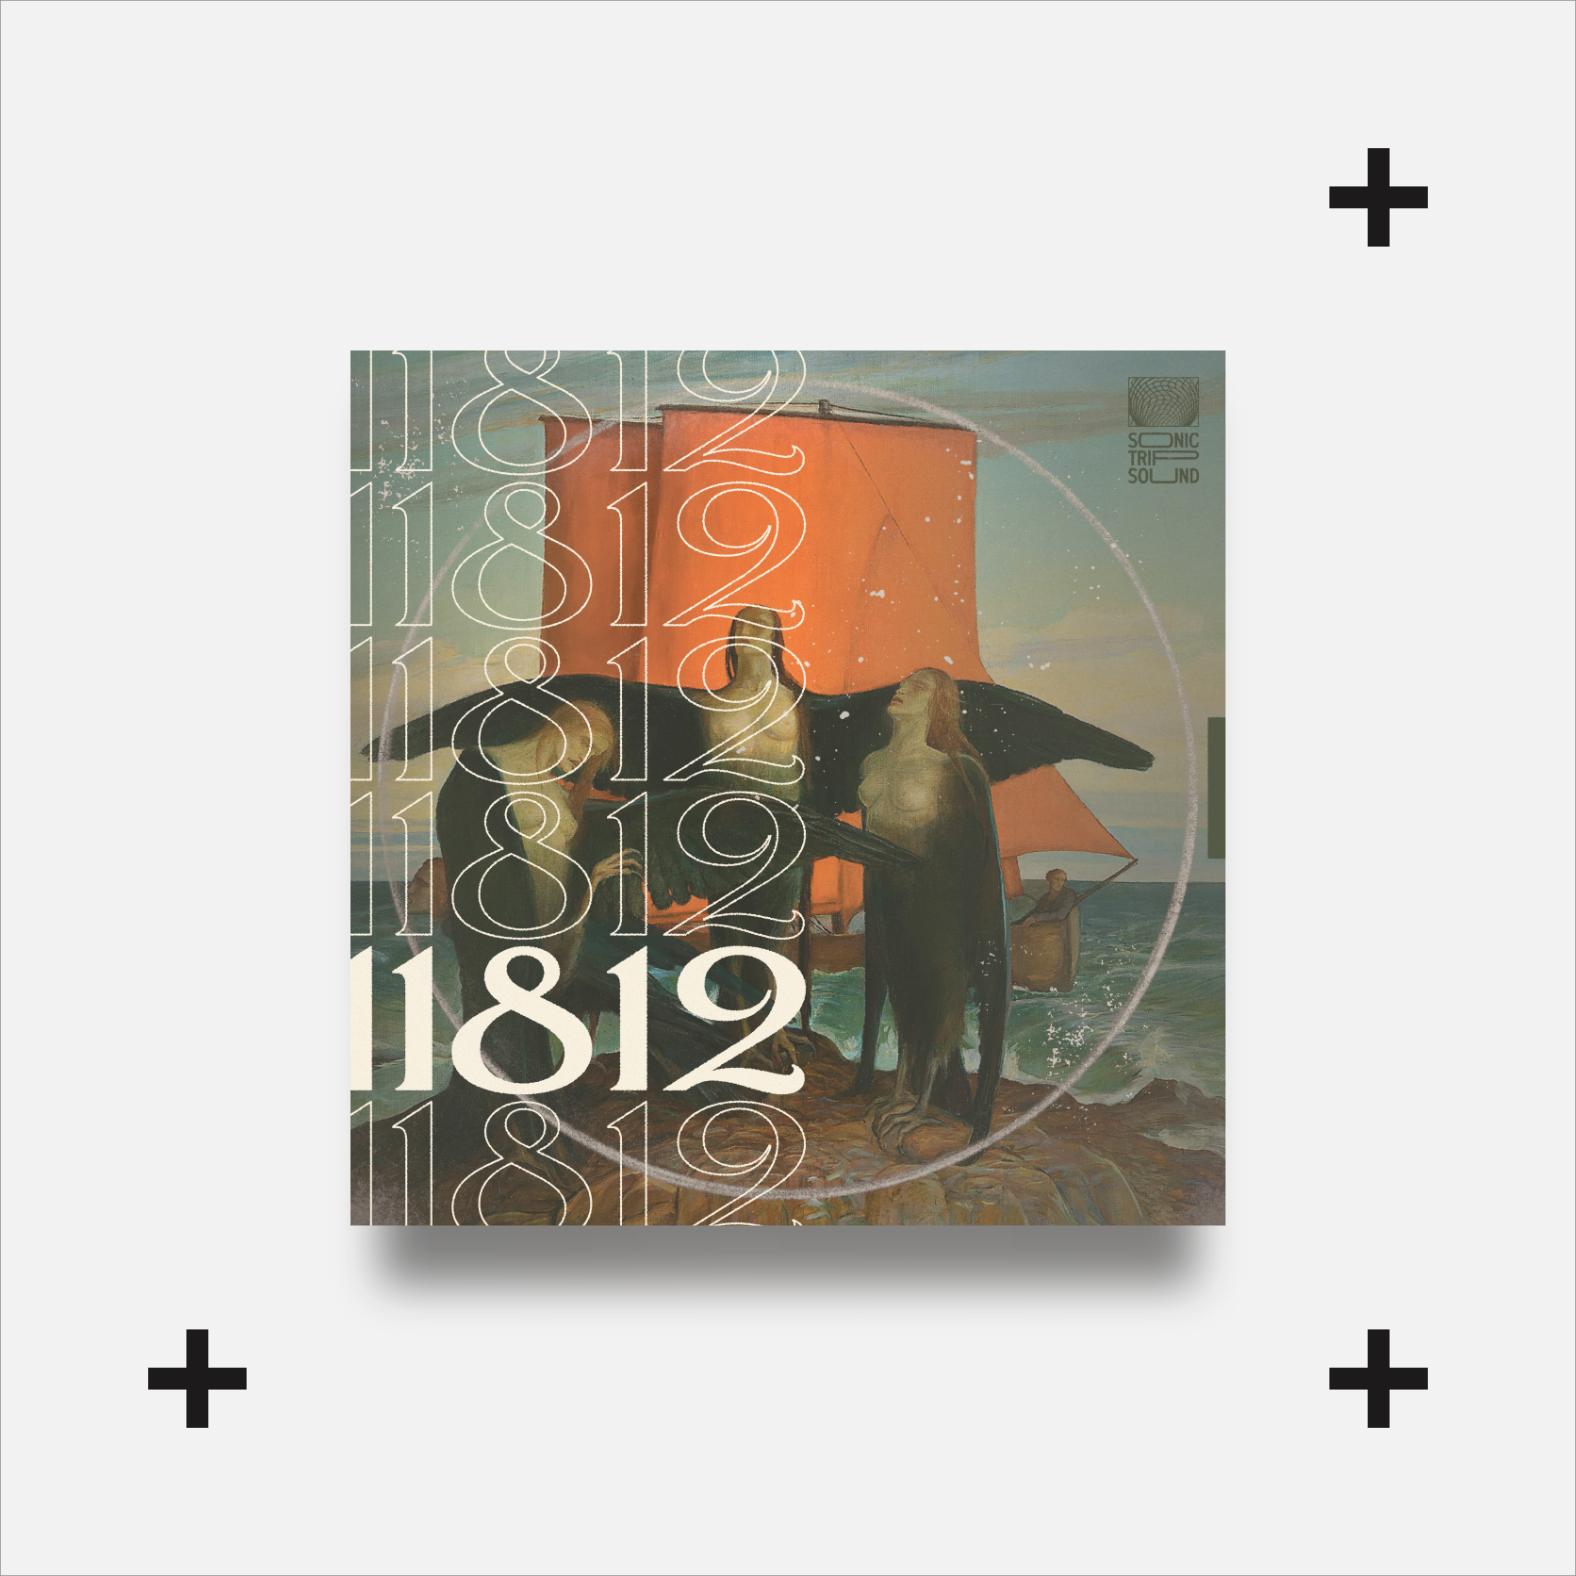 """1504"""